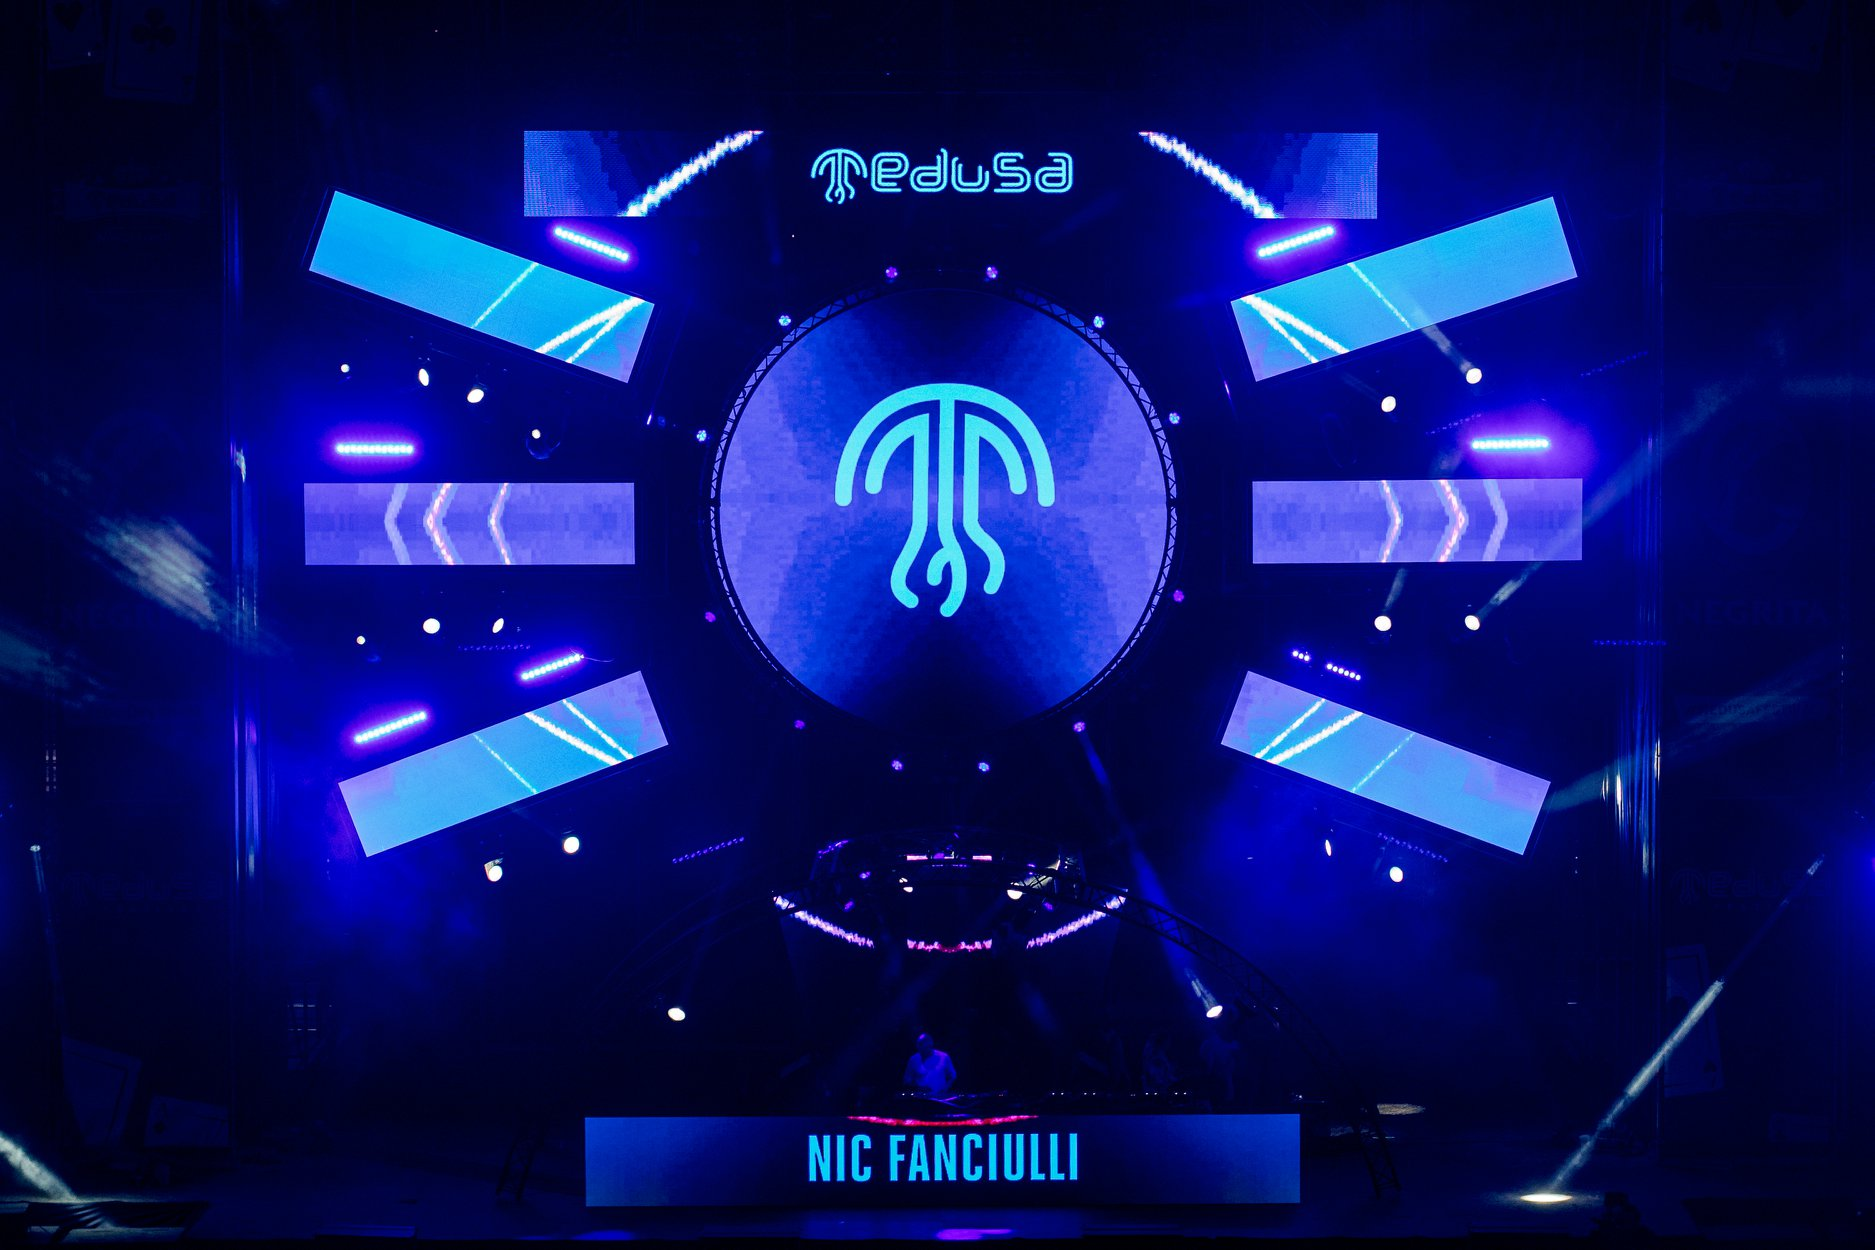 Medusa Sunbeach Festival escenario Ressonance Nic Fanciulli